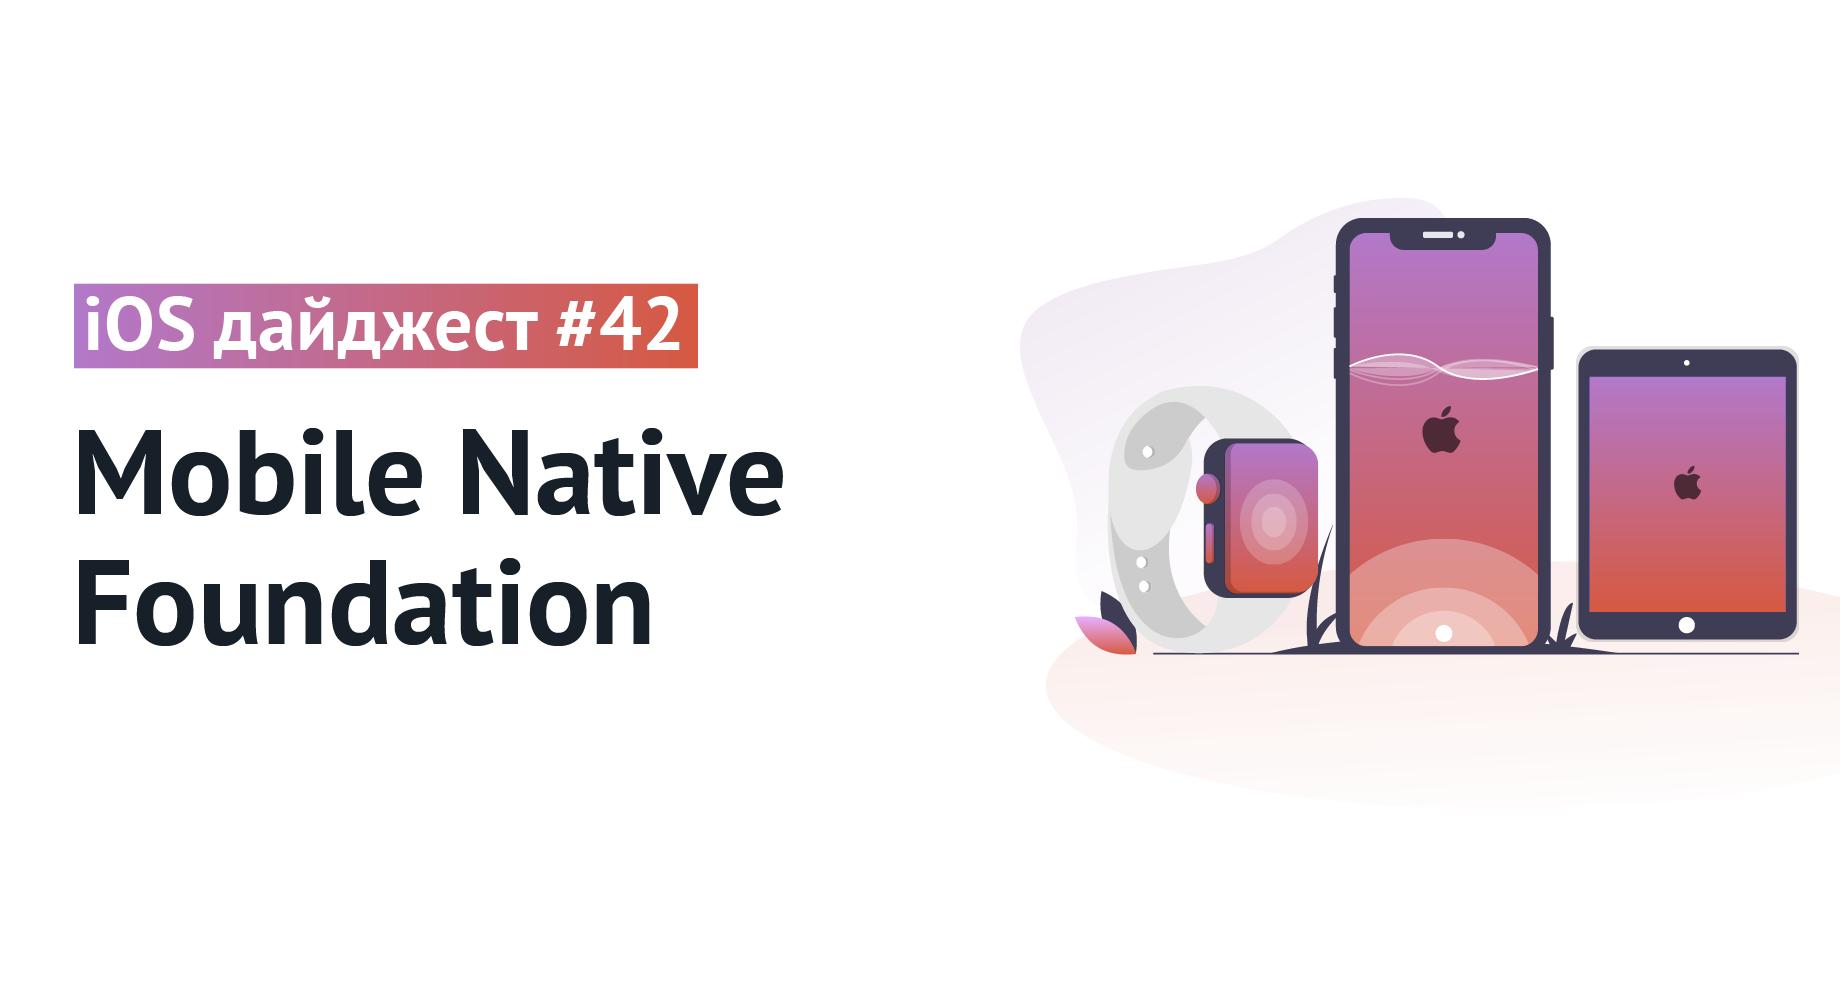 iOS дайджест #42: Mobile Native Foundation